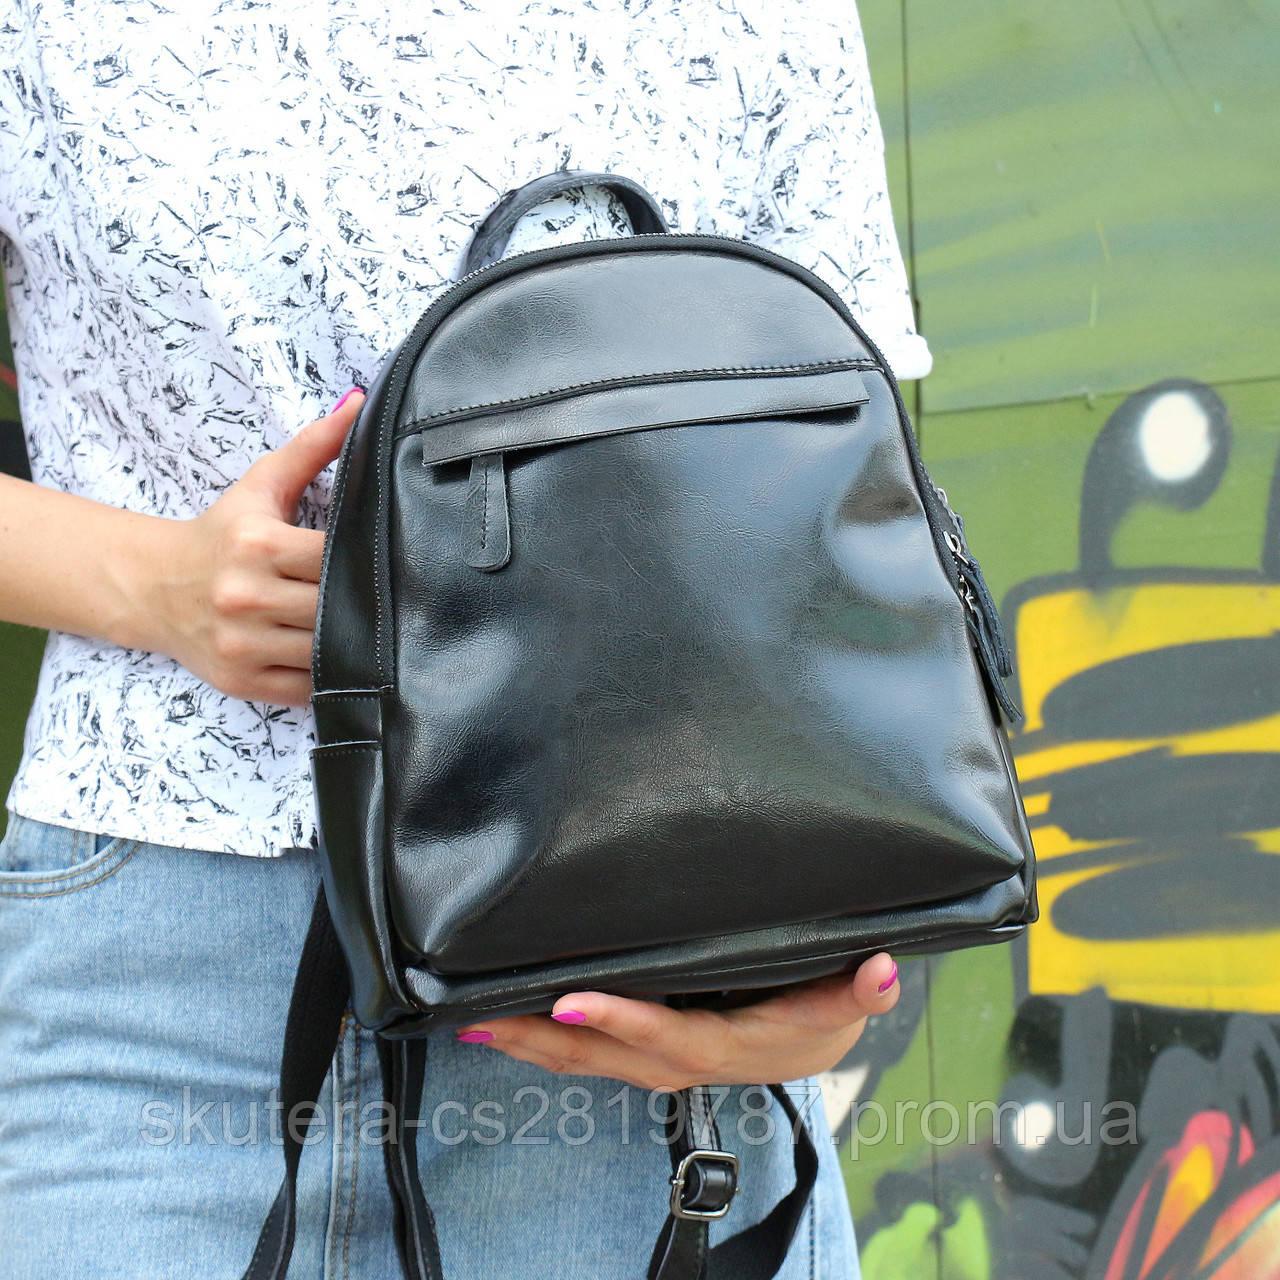 16faa919d8d3 Женский кожаный рюкзак